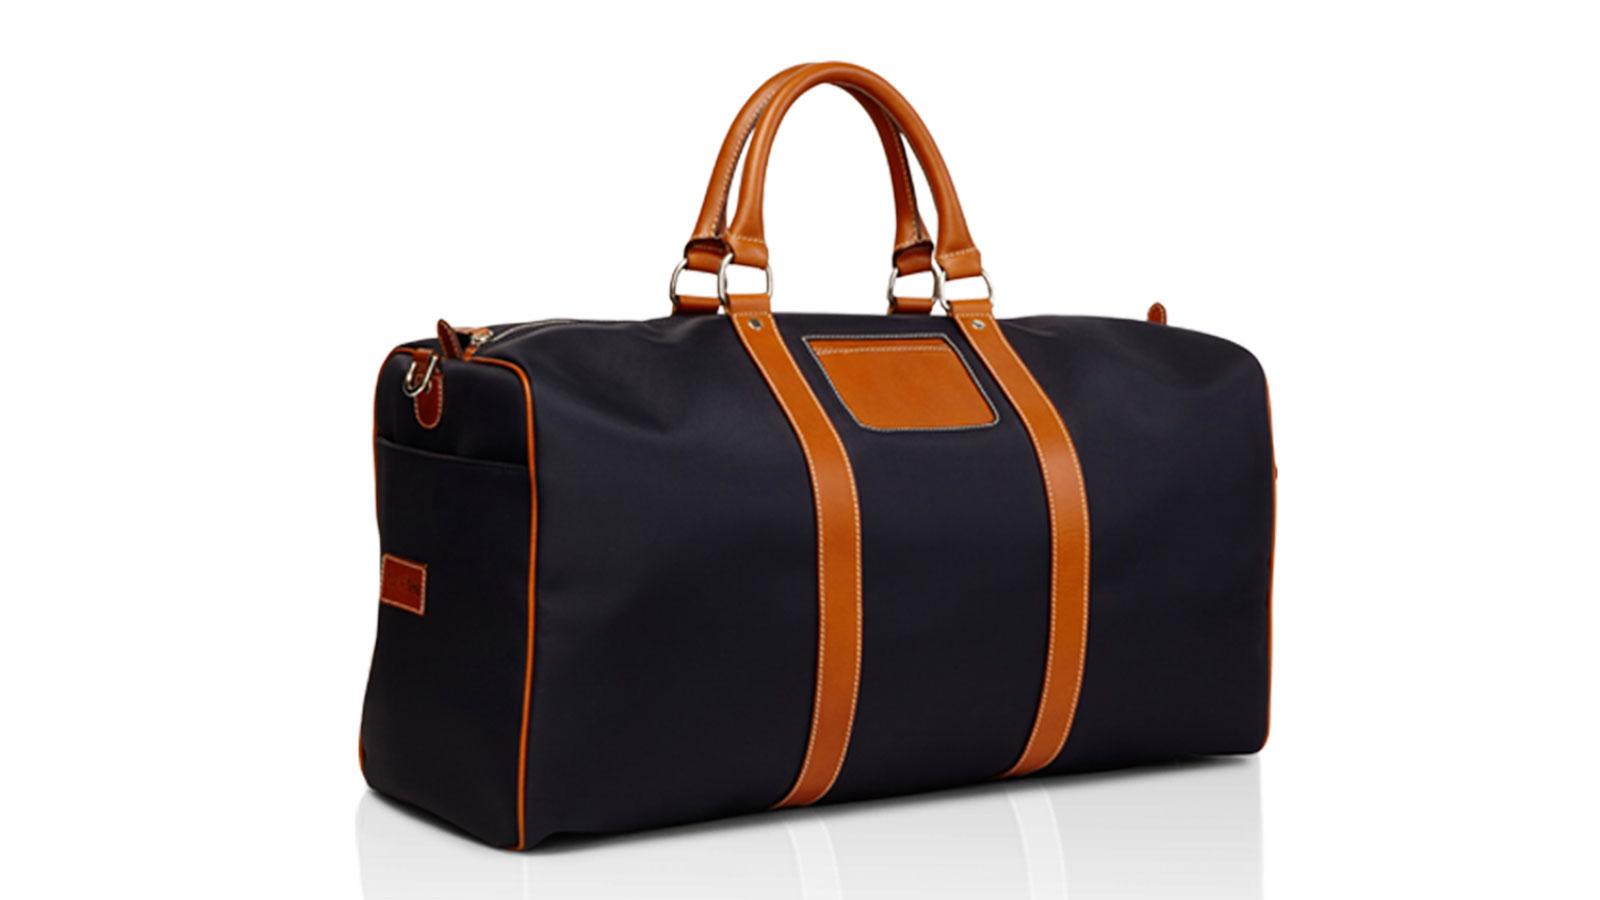 Travelteq Weekender Inside Out Duffel Bag | the best weekender bags for men